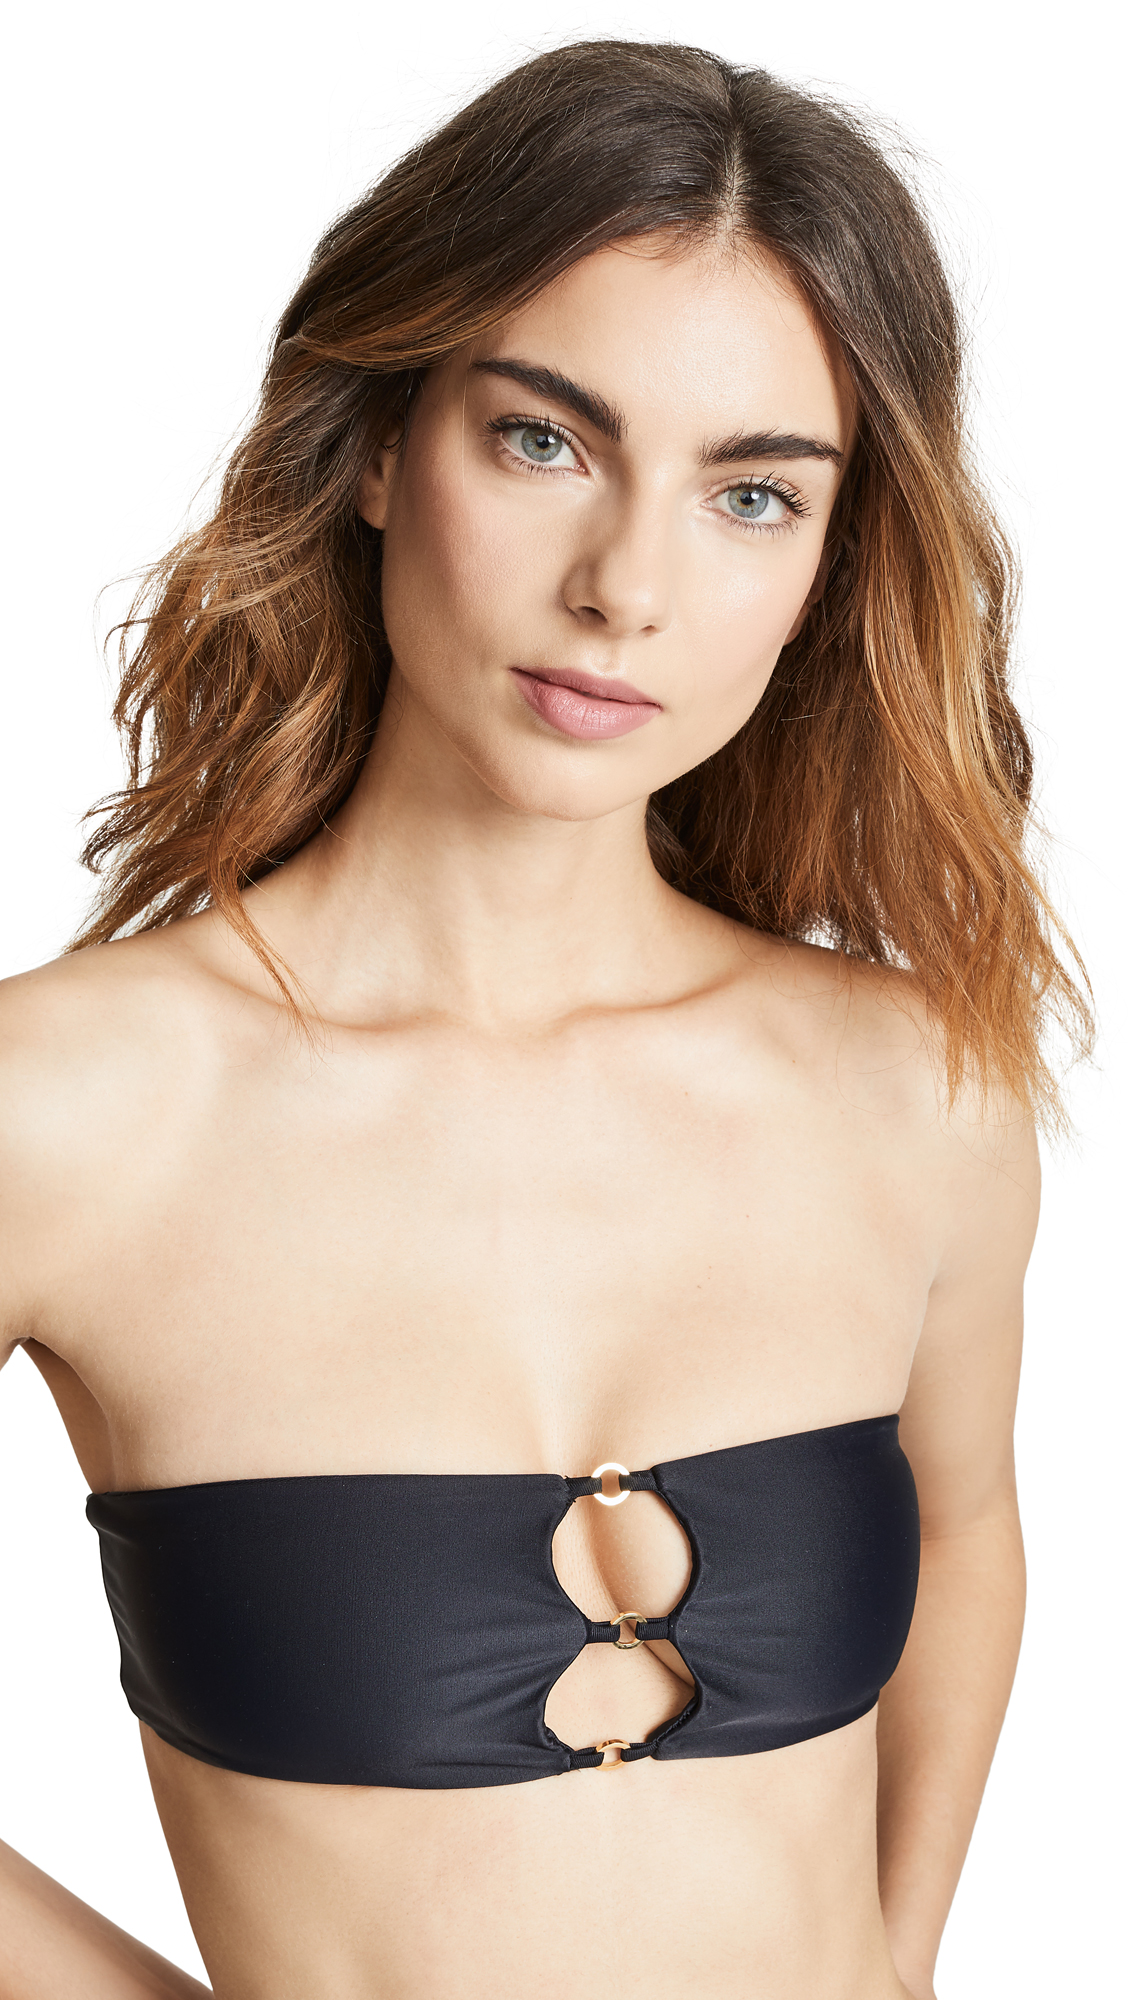 JADE SWIM Ace Bikini Top in Black